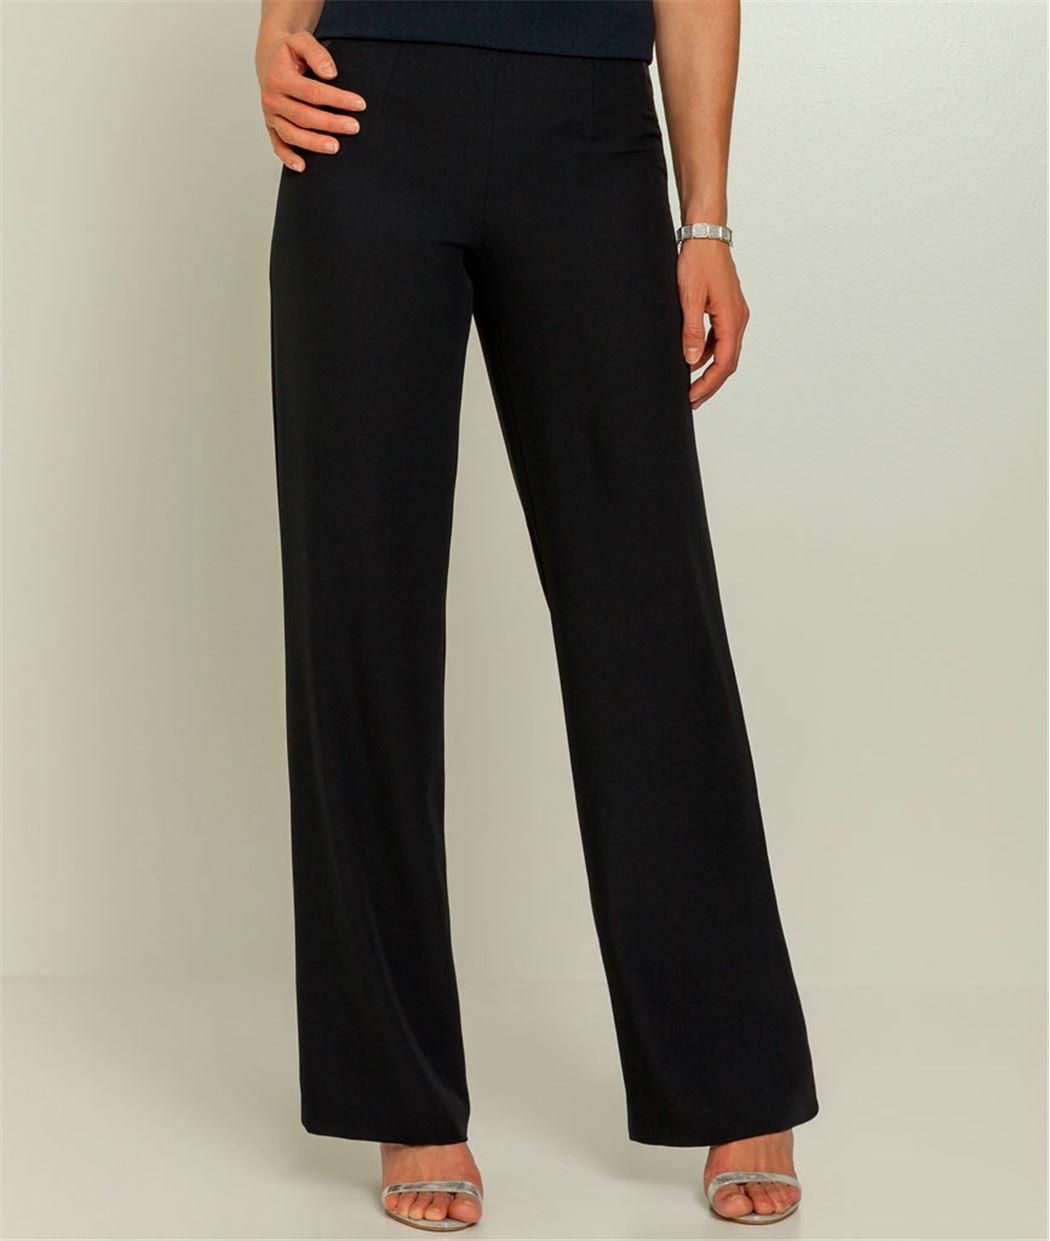 pantalon femme fluide taille haute bleu marine grain de. Black Bedroom Furniture Sets. Home Design Ideas